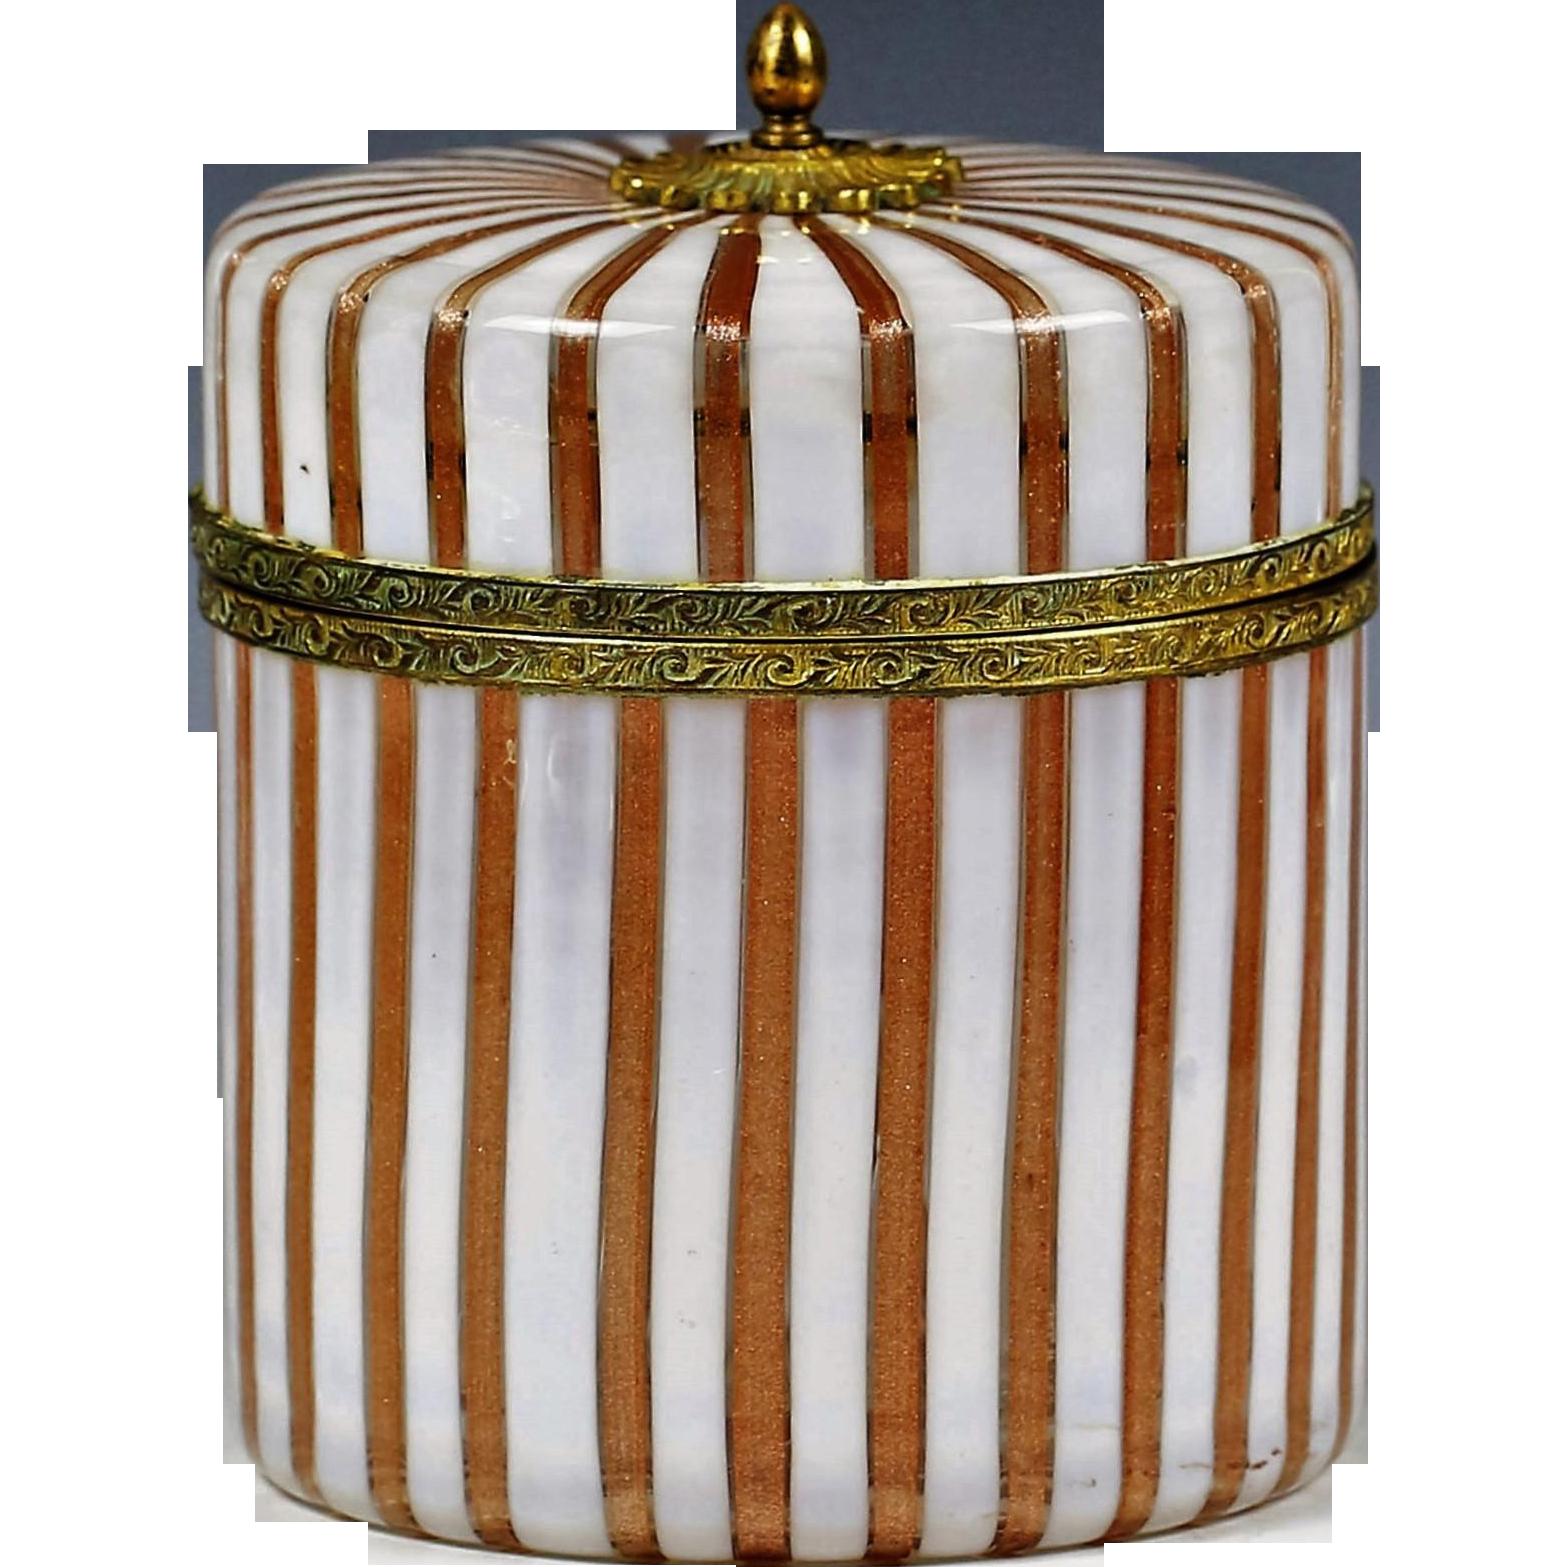 XL Italy Murano copper aventurine Art Glass hinged Box brass gilt mounts